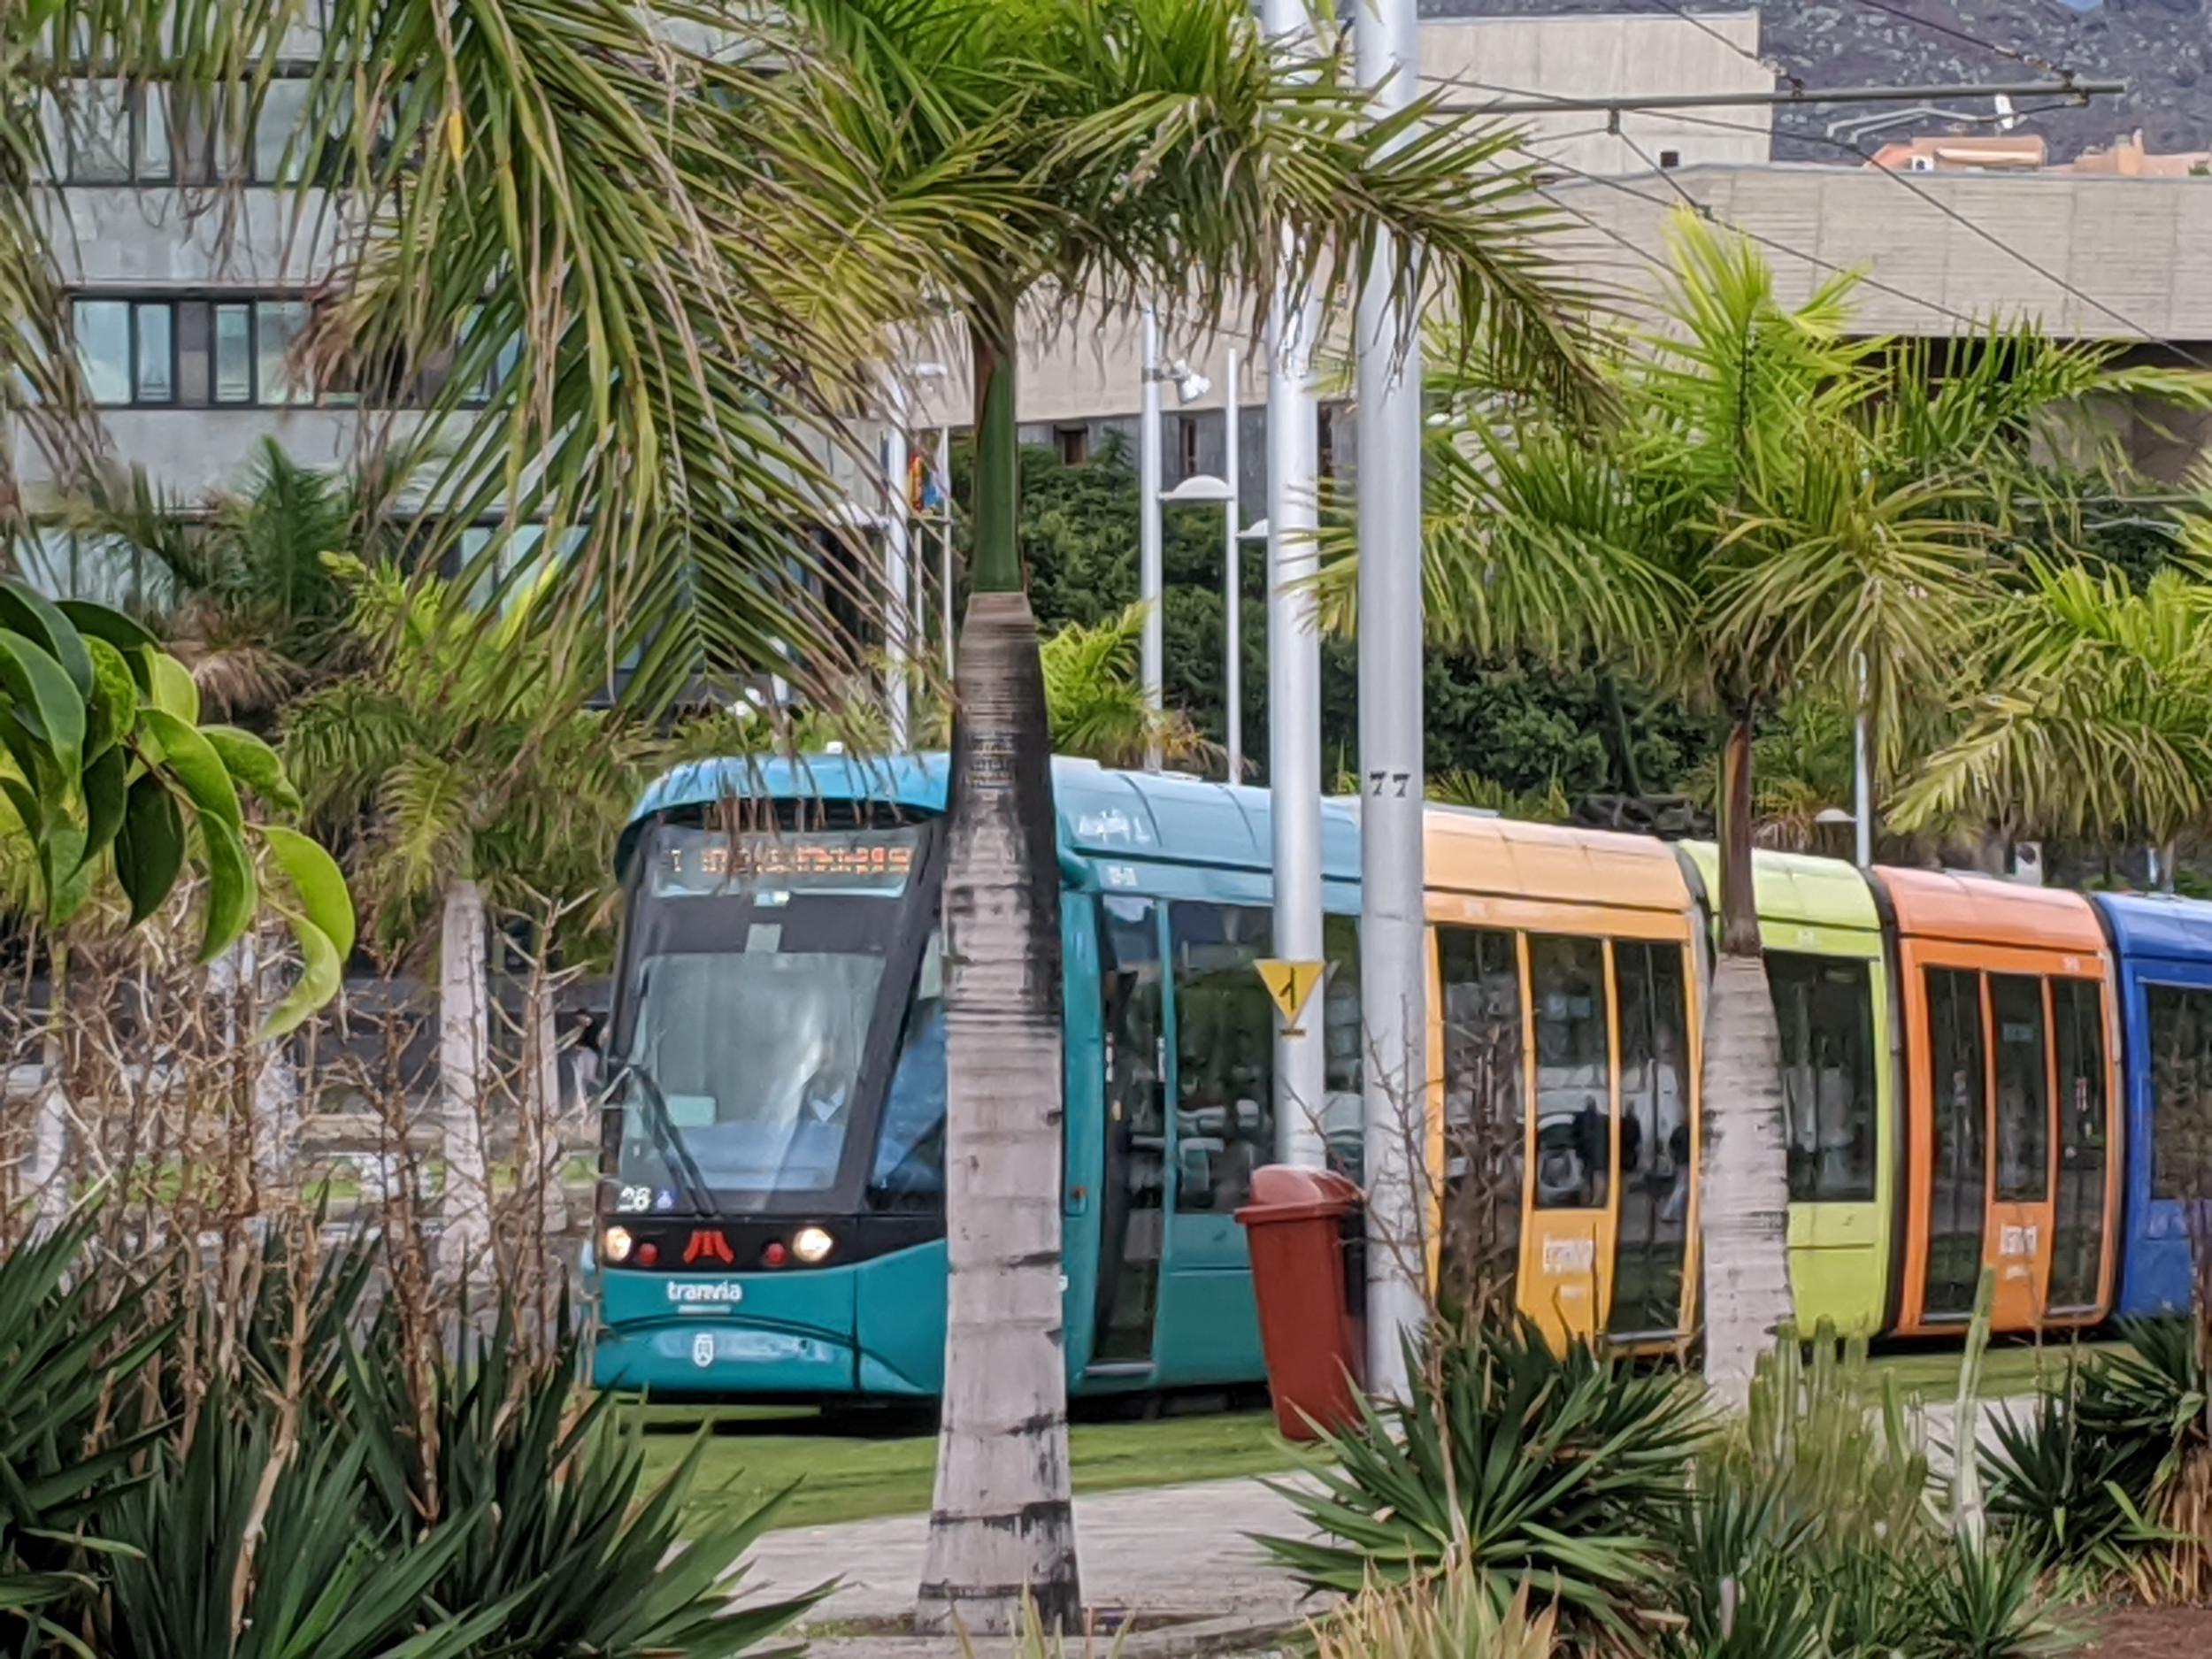 tram-faehrt-intercambiador-an.jpg